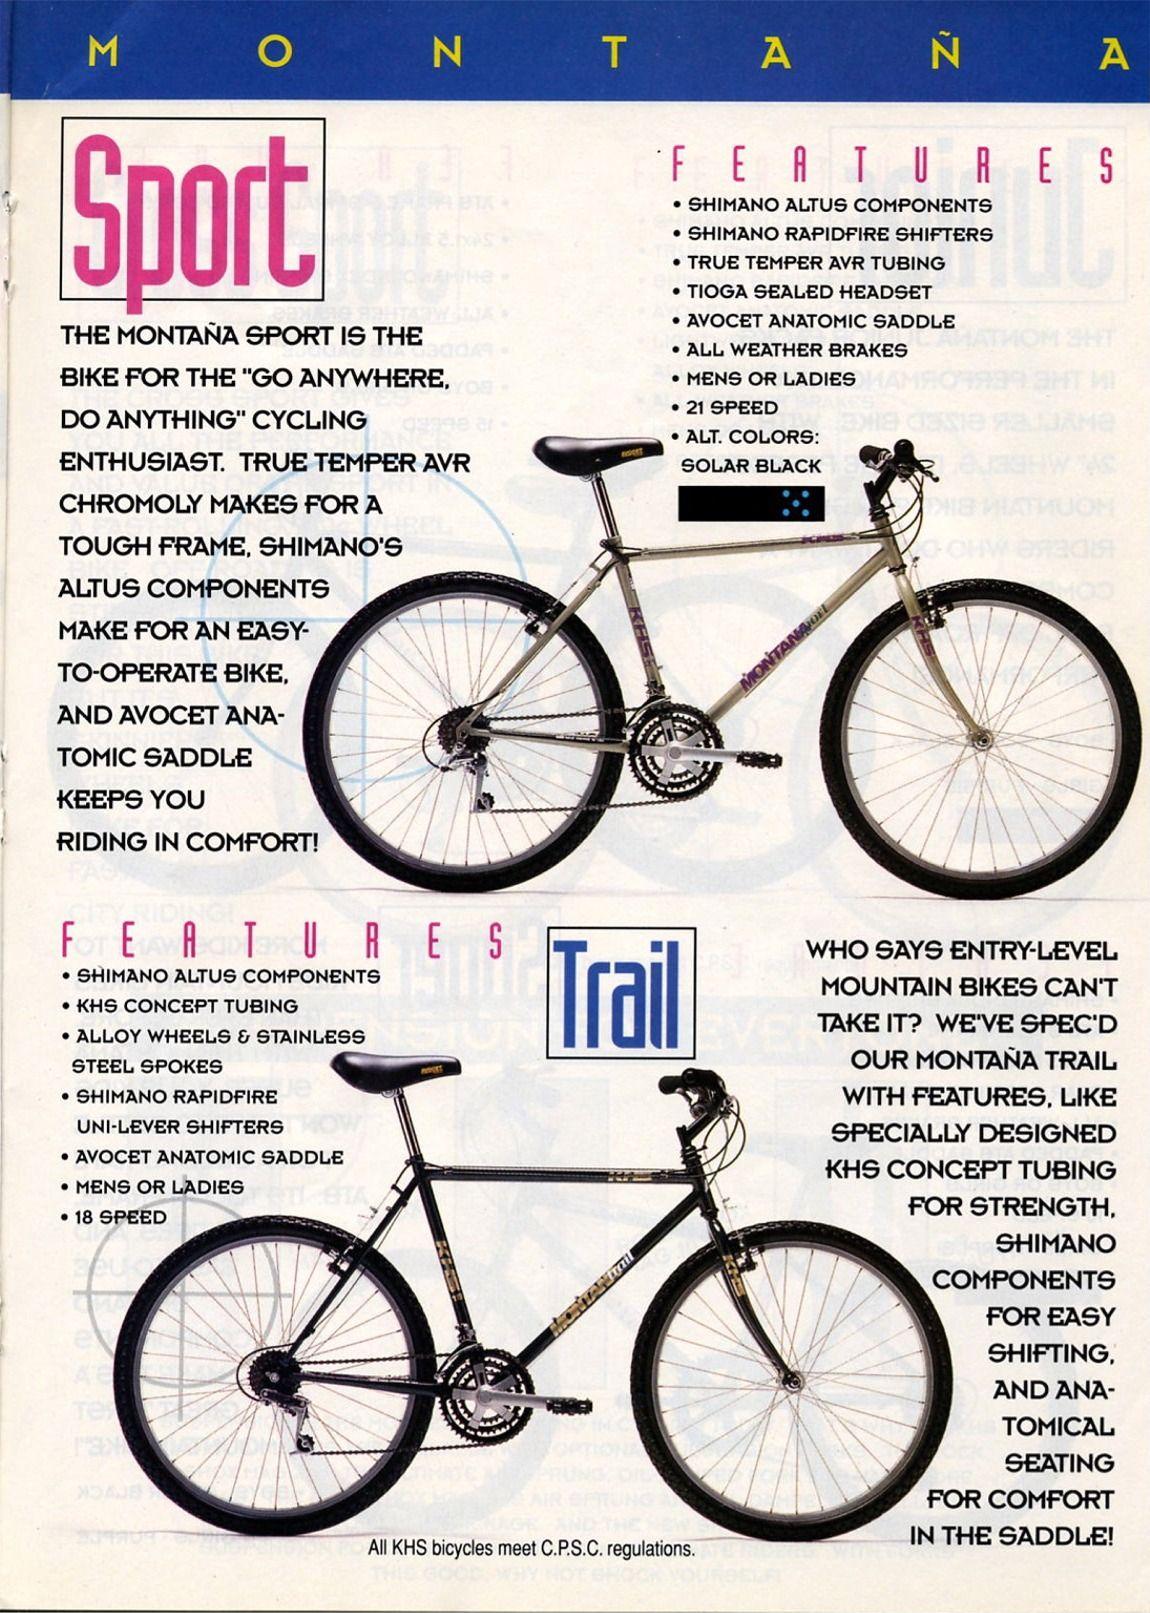 1993 Khs Bicycles Catalog Bicycle Tioga Altus